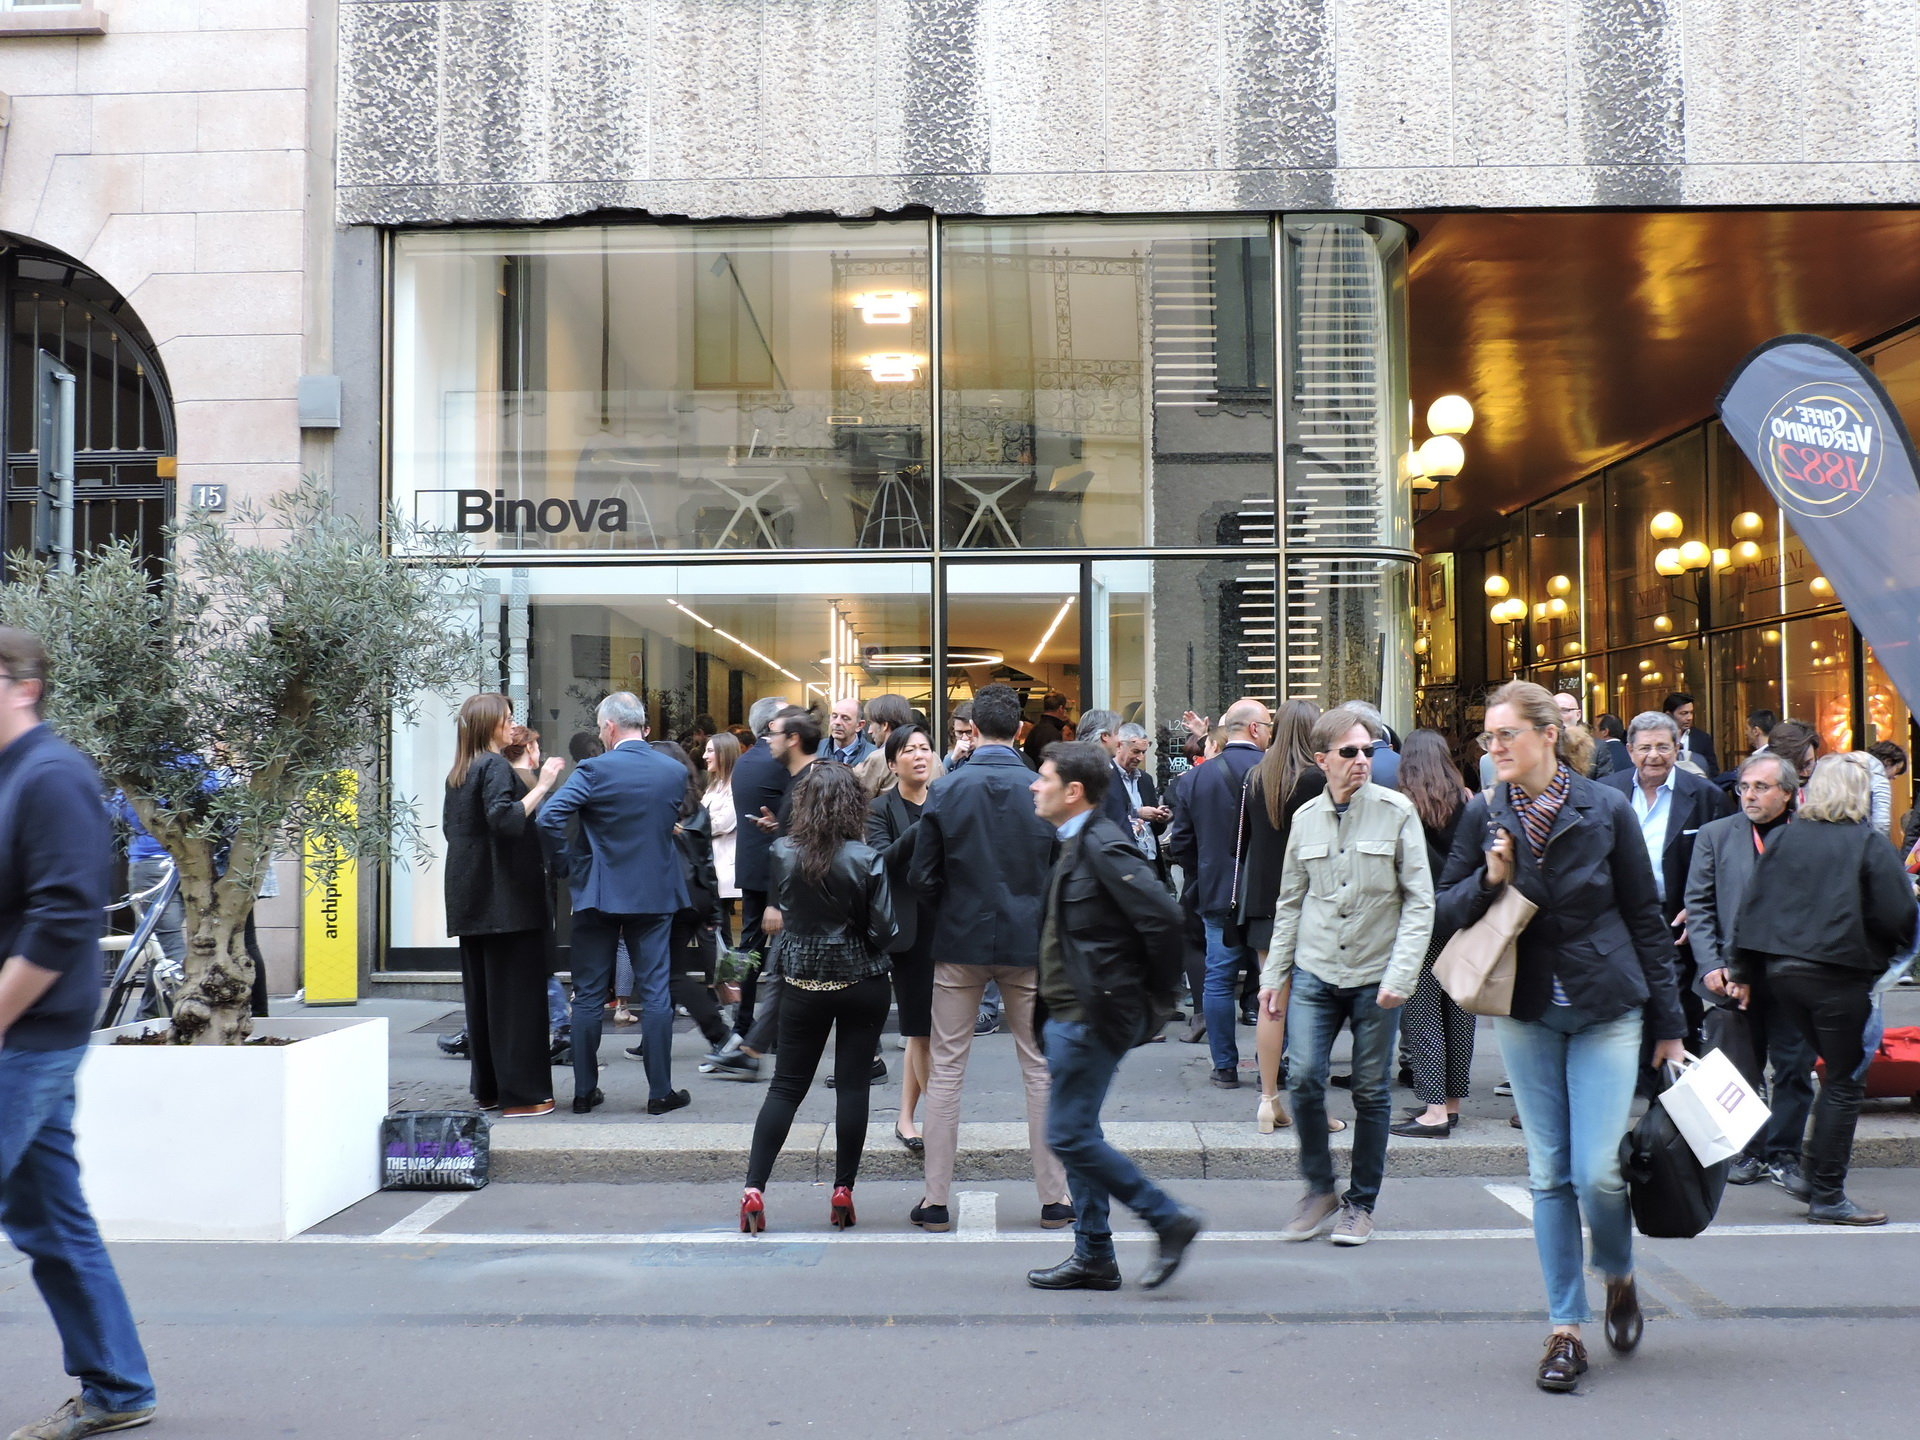 Fuorisalone 2017 - Desing Week 2017 - Binova Milano - cocktail con Davide Oldani e Schonhuber Franchi 022